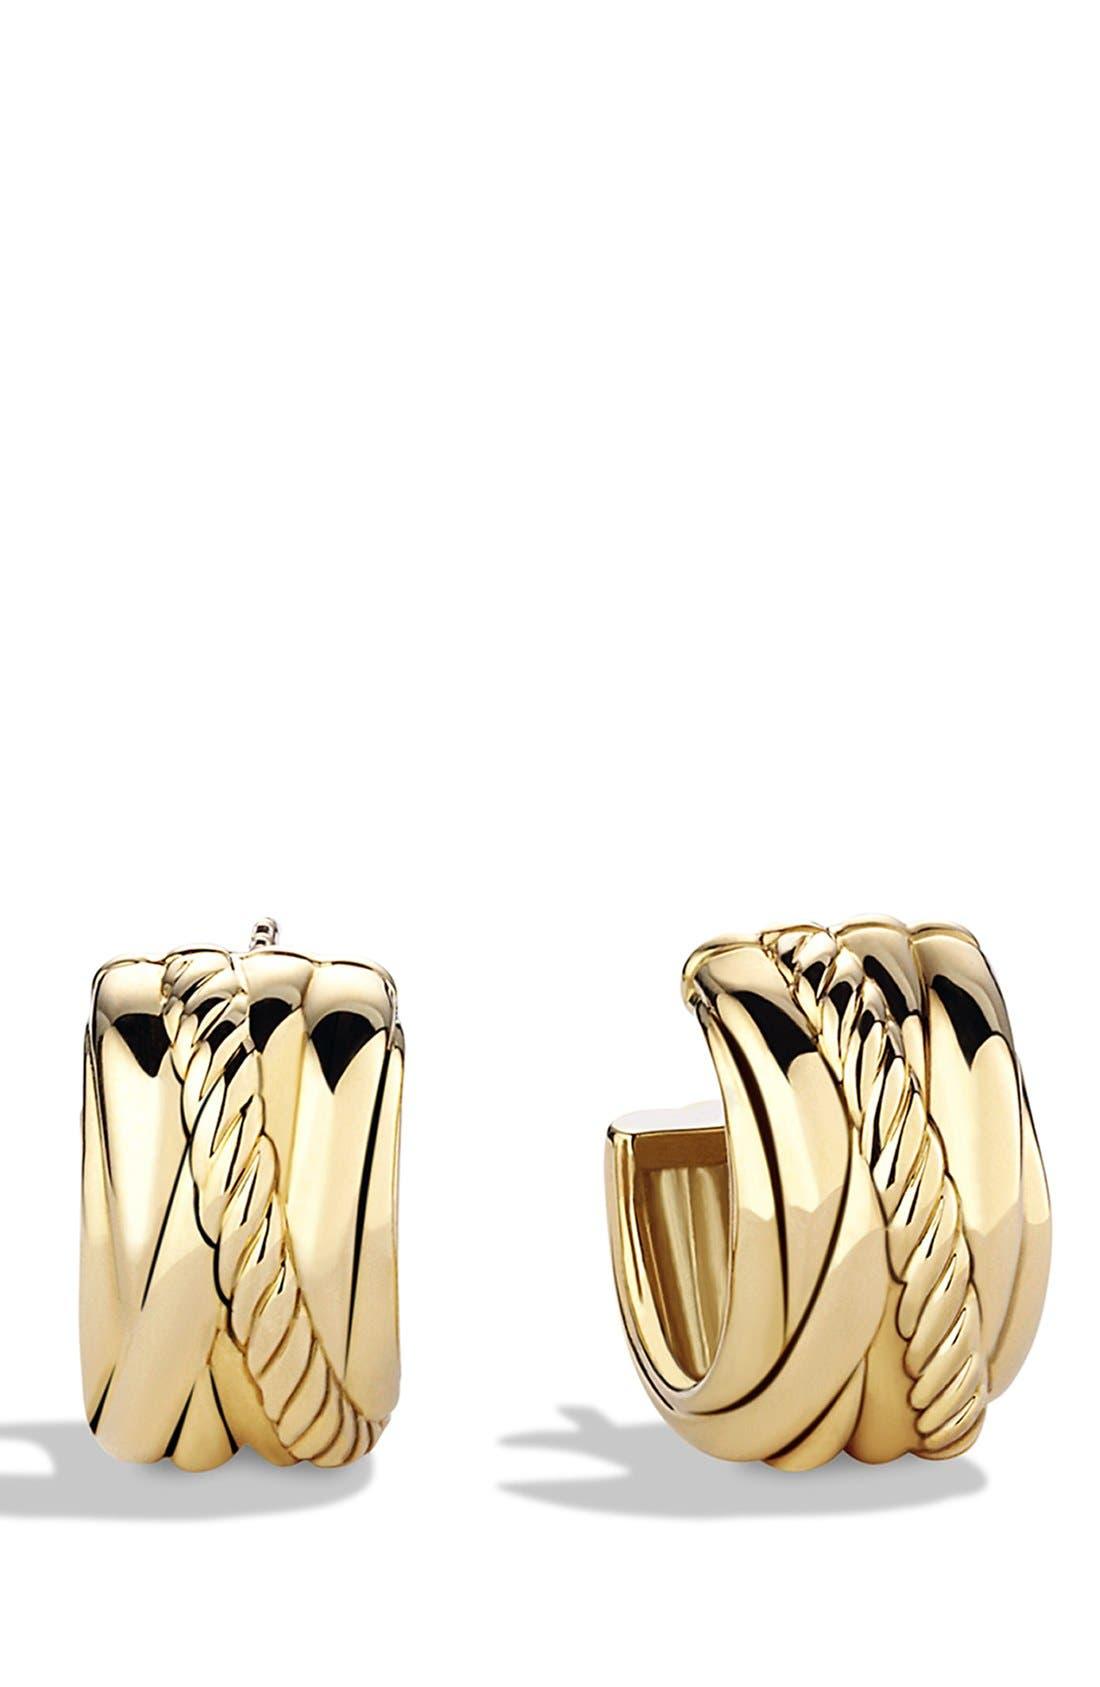 Alternate Image 1 Selected - David Yurman 'Crossover' Earrings in Gold